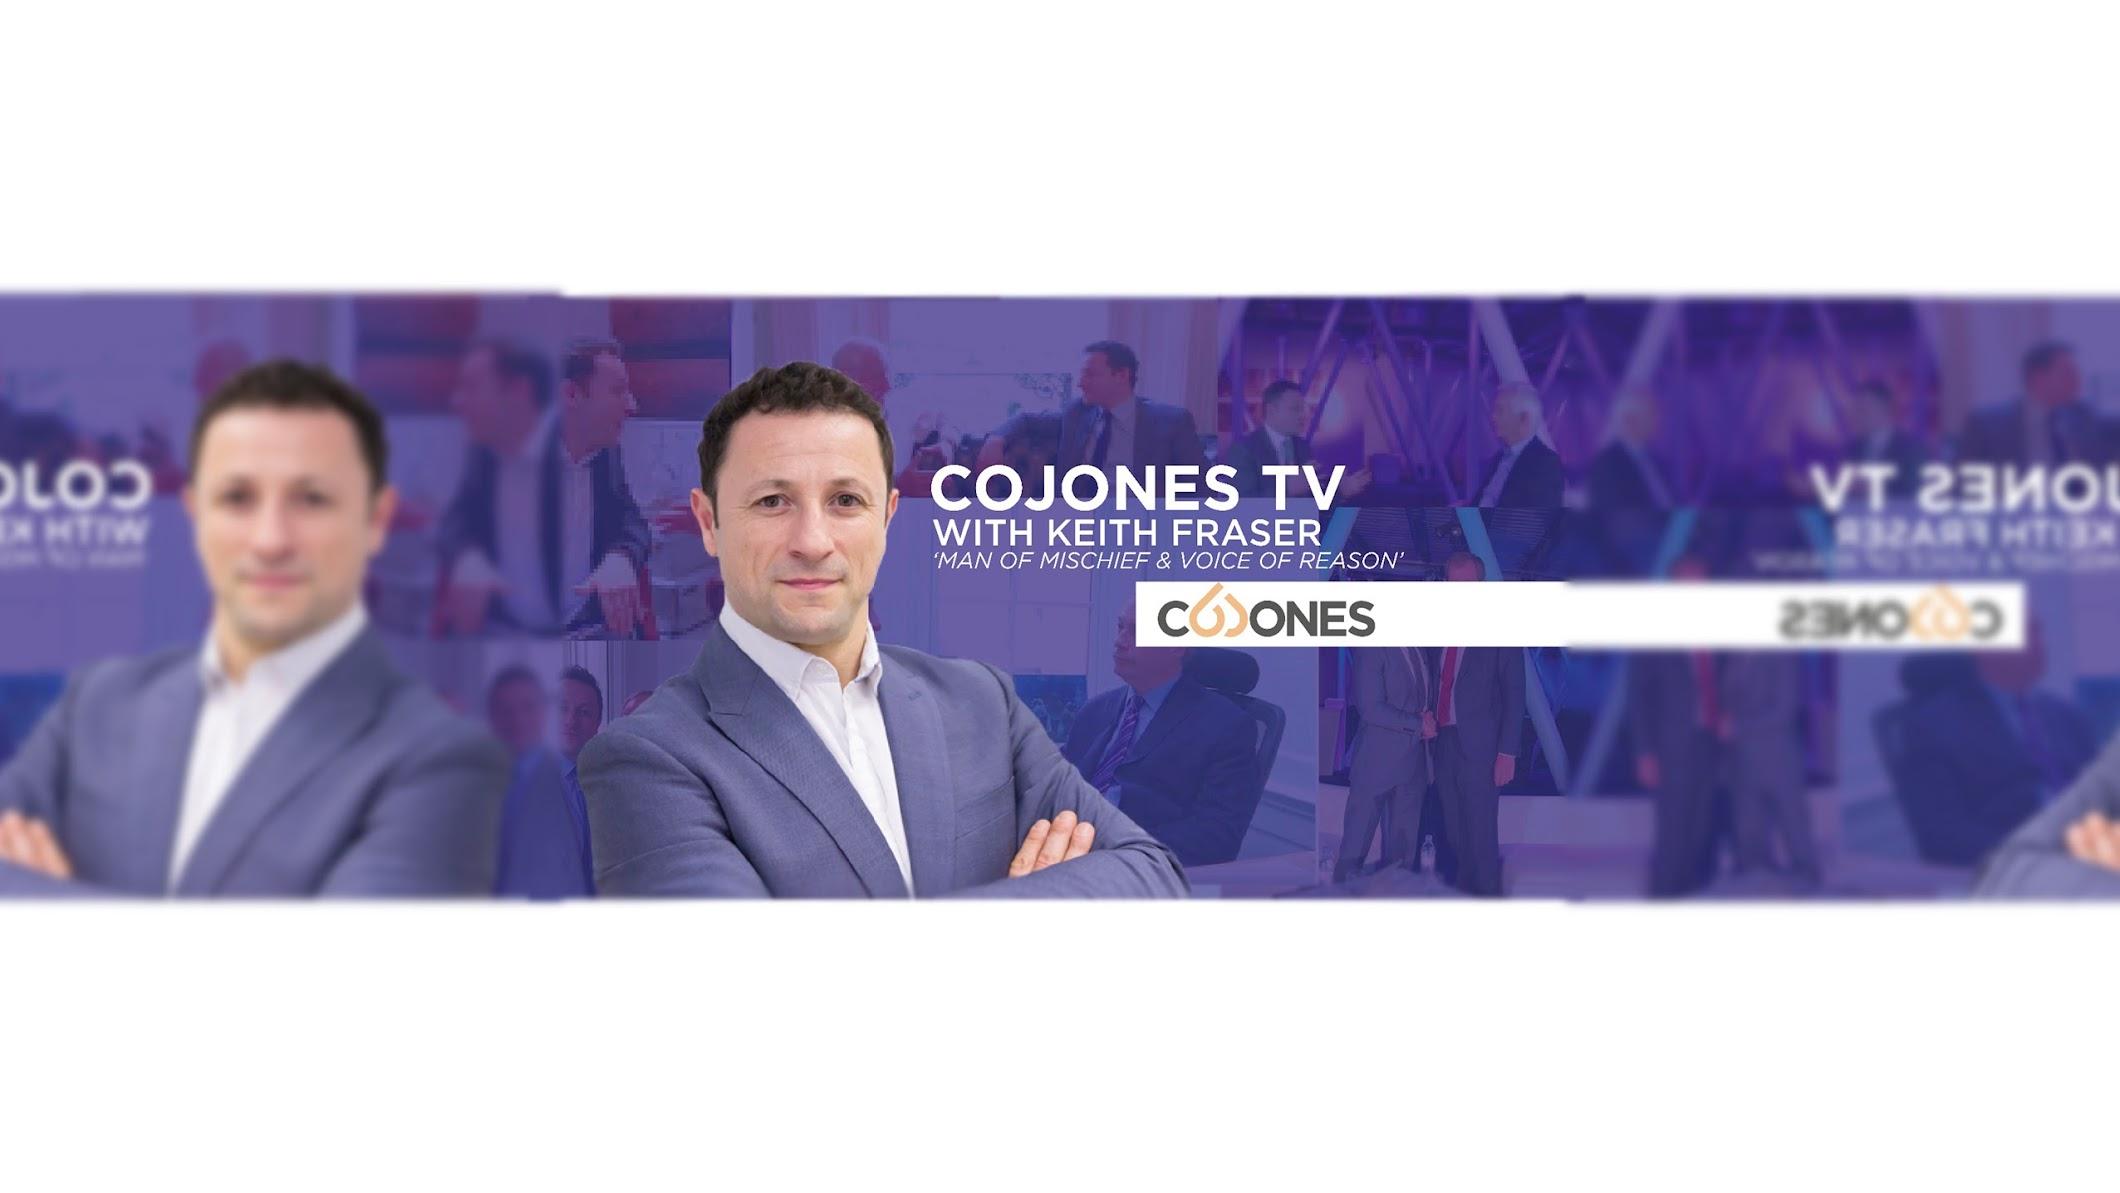 Cojones TV